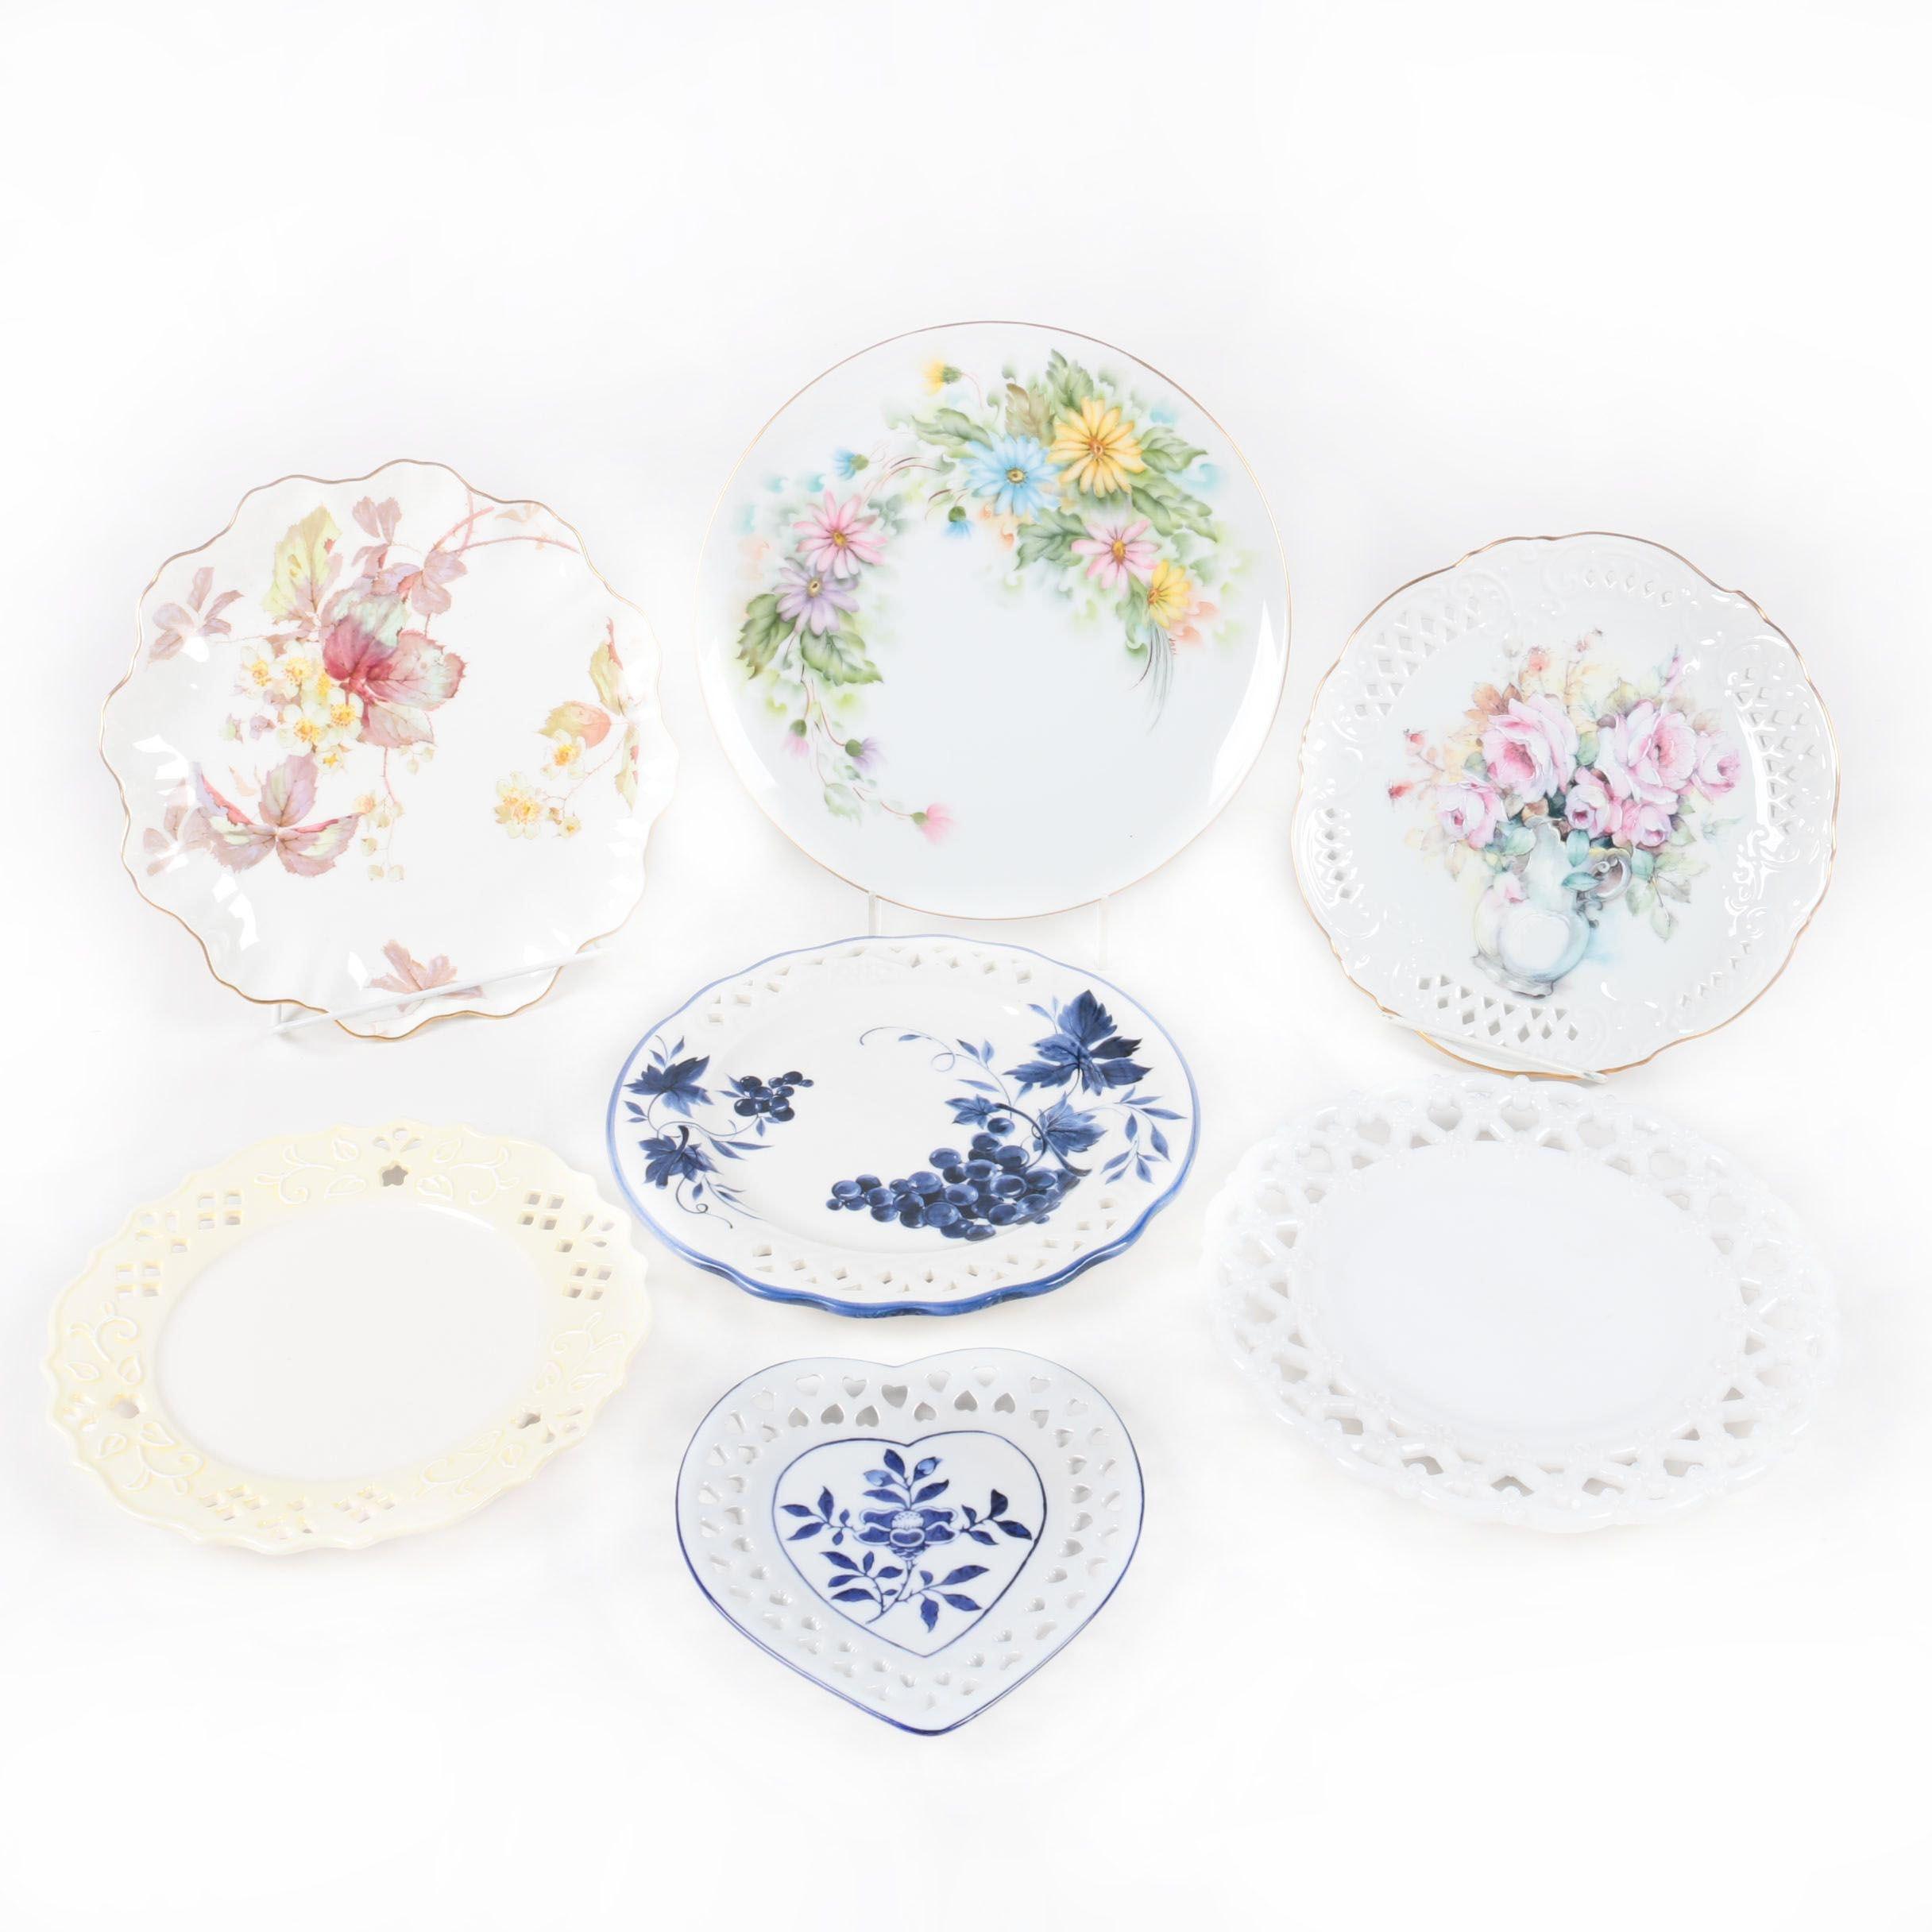 Seven Decorative Floral Patterned Ceramic Plates